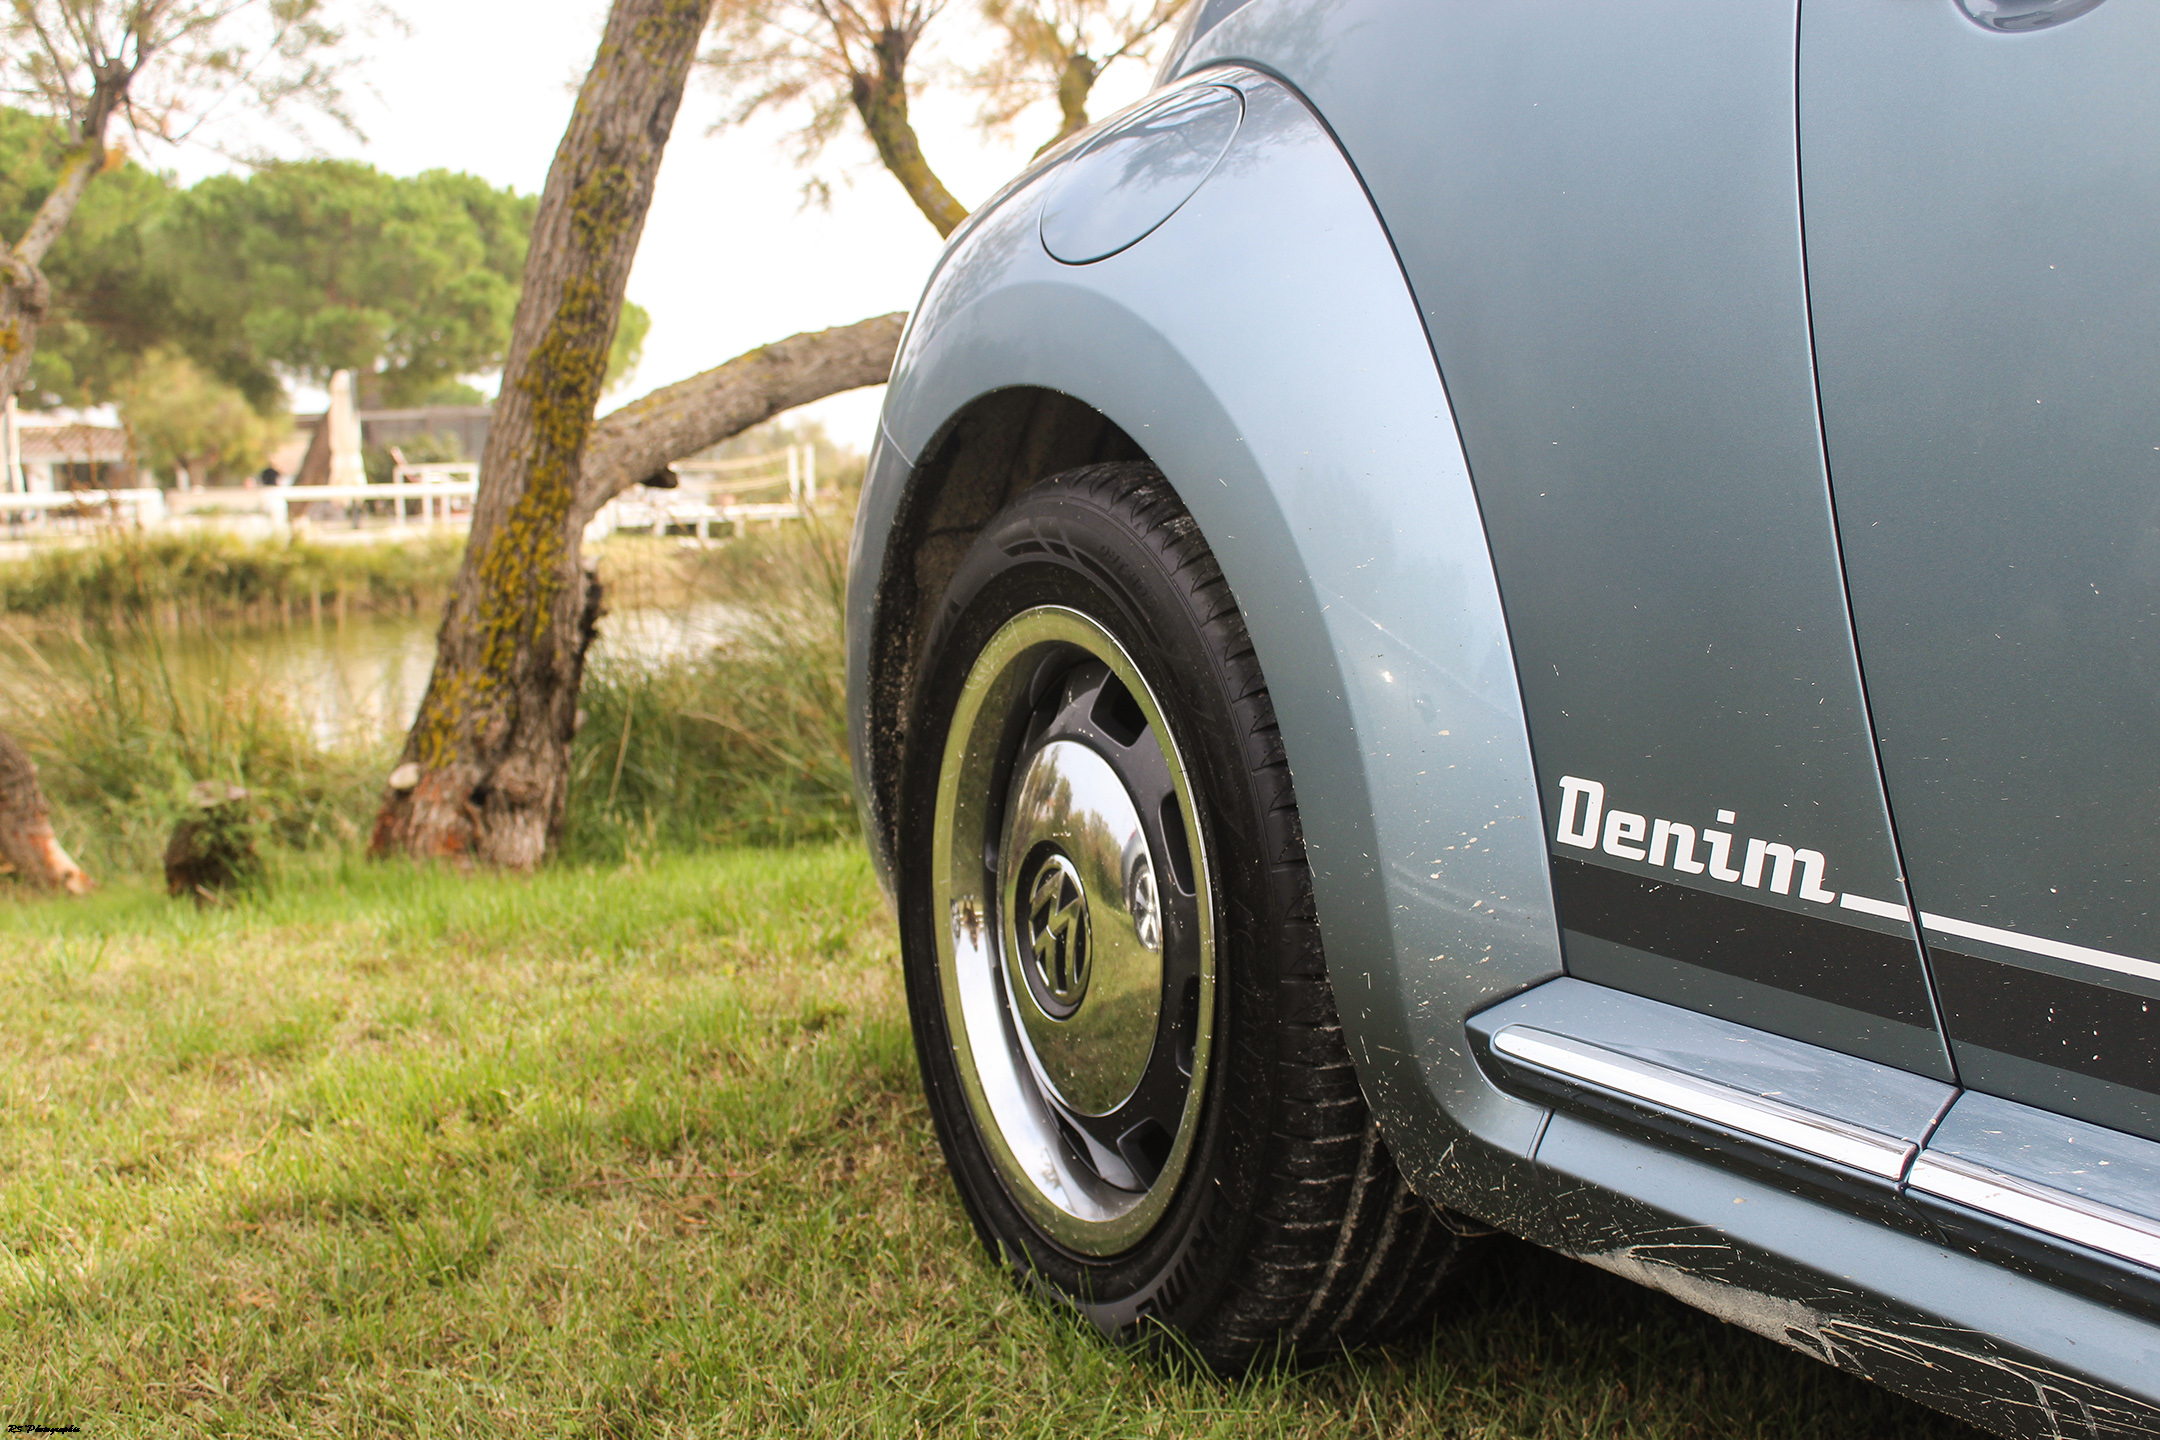 vwcox16-volkswagen-coccinelle-denim-cabriolet-jante-rim-arnaud-demasier-rsphotographie